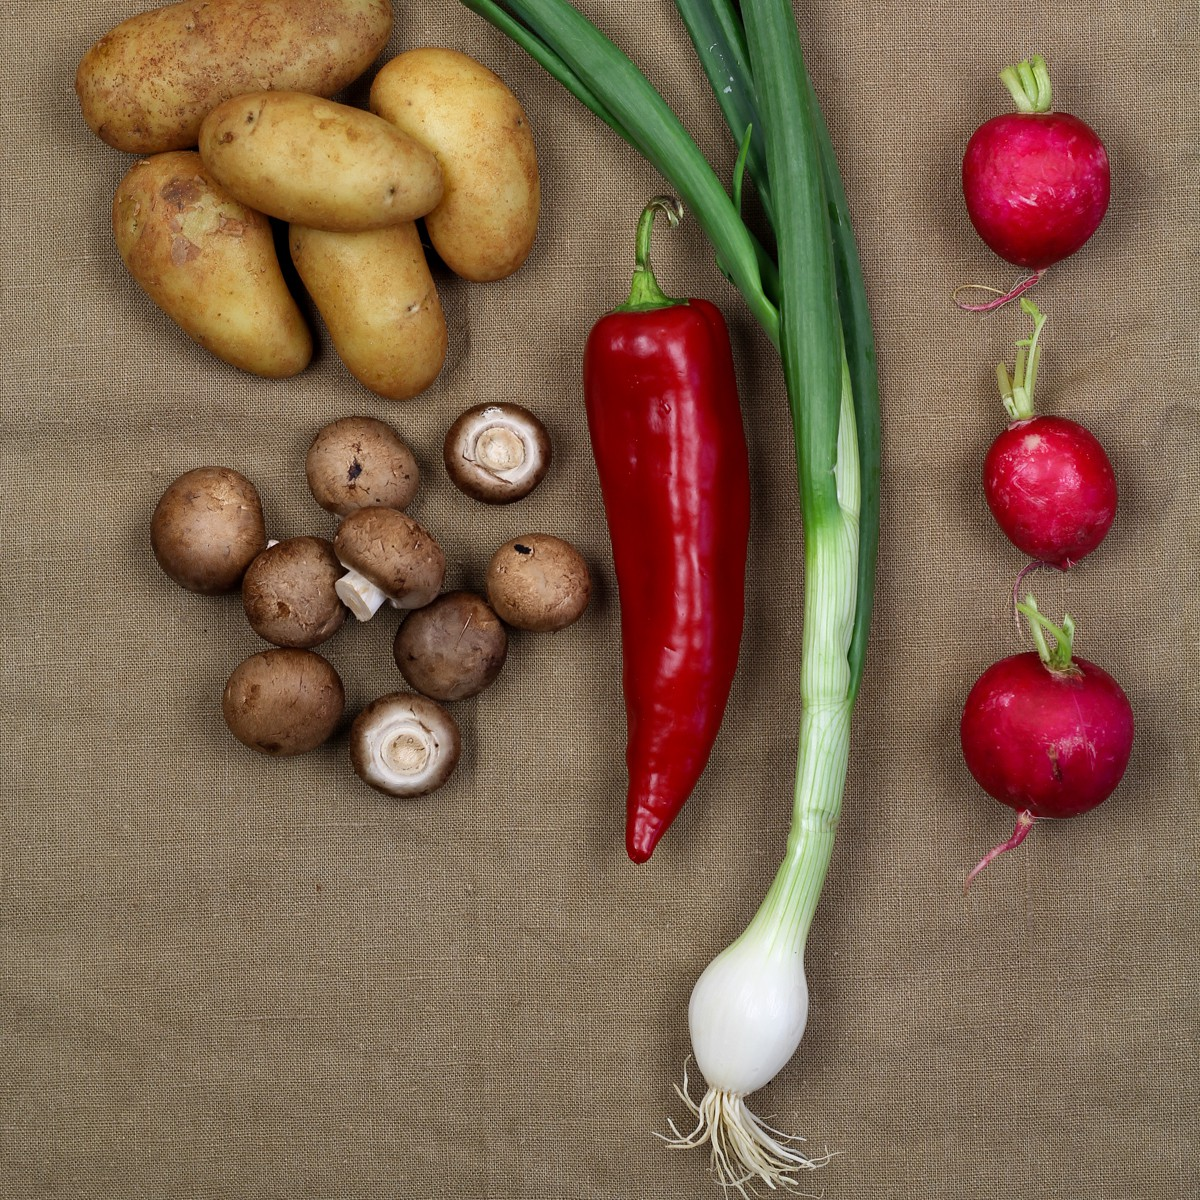 kitchenmate-veggieschnitzel1